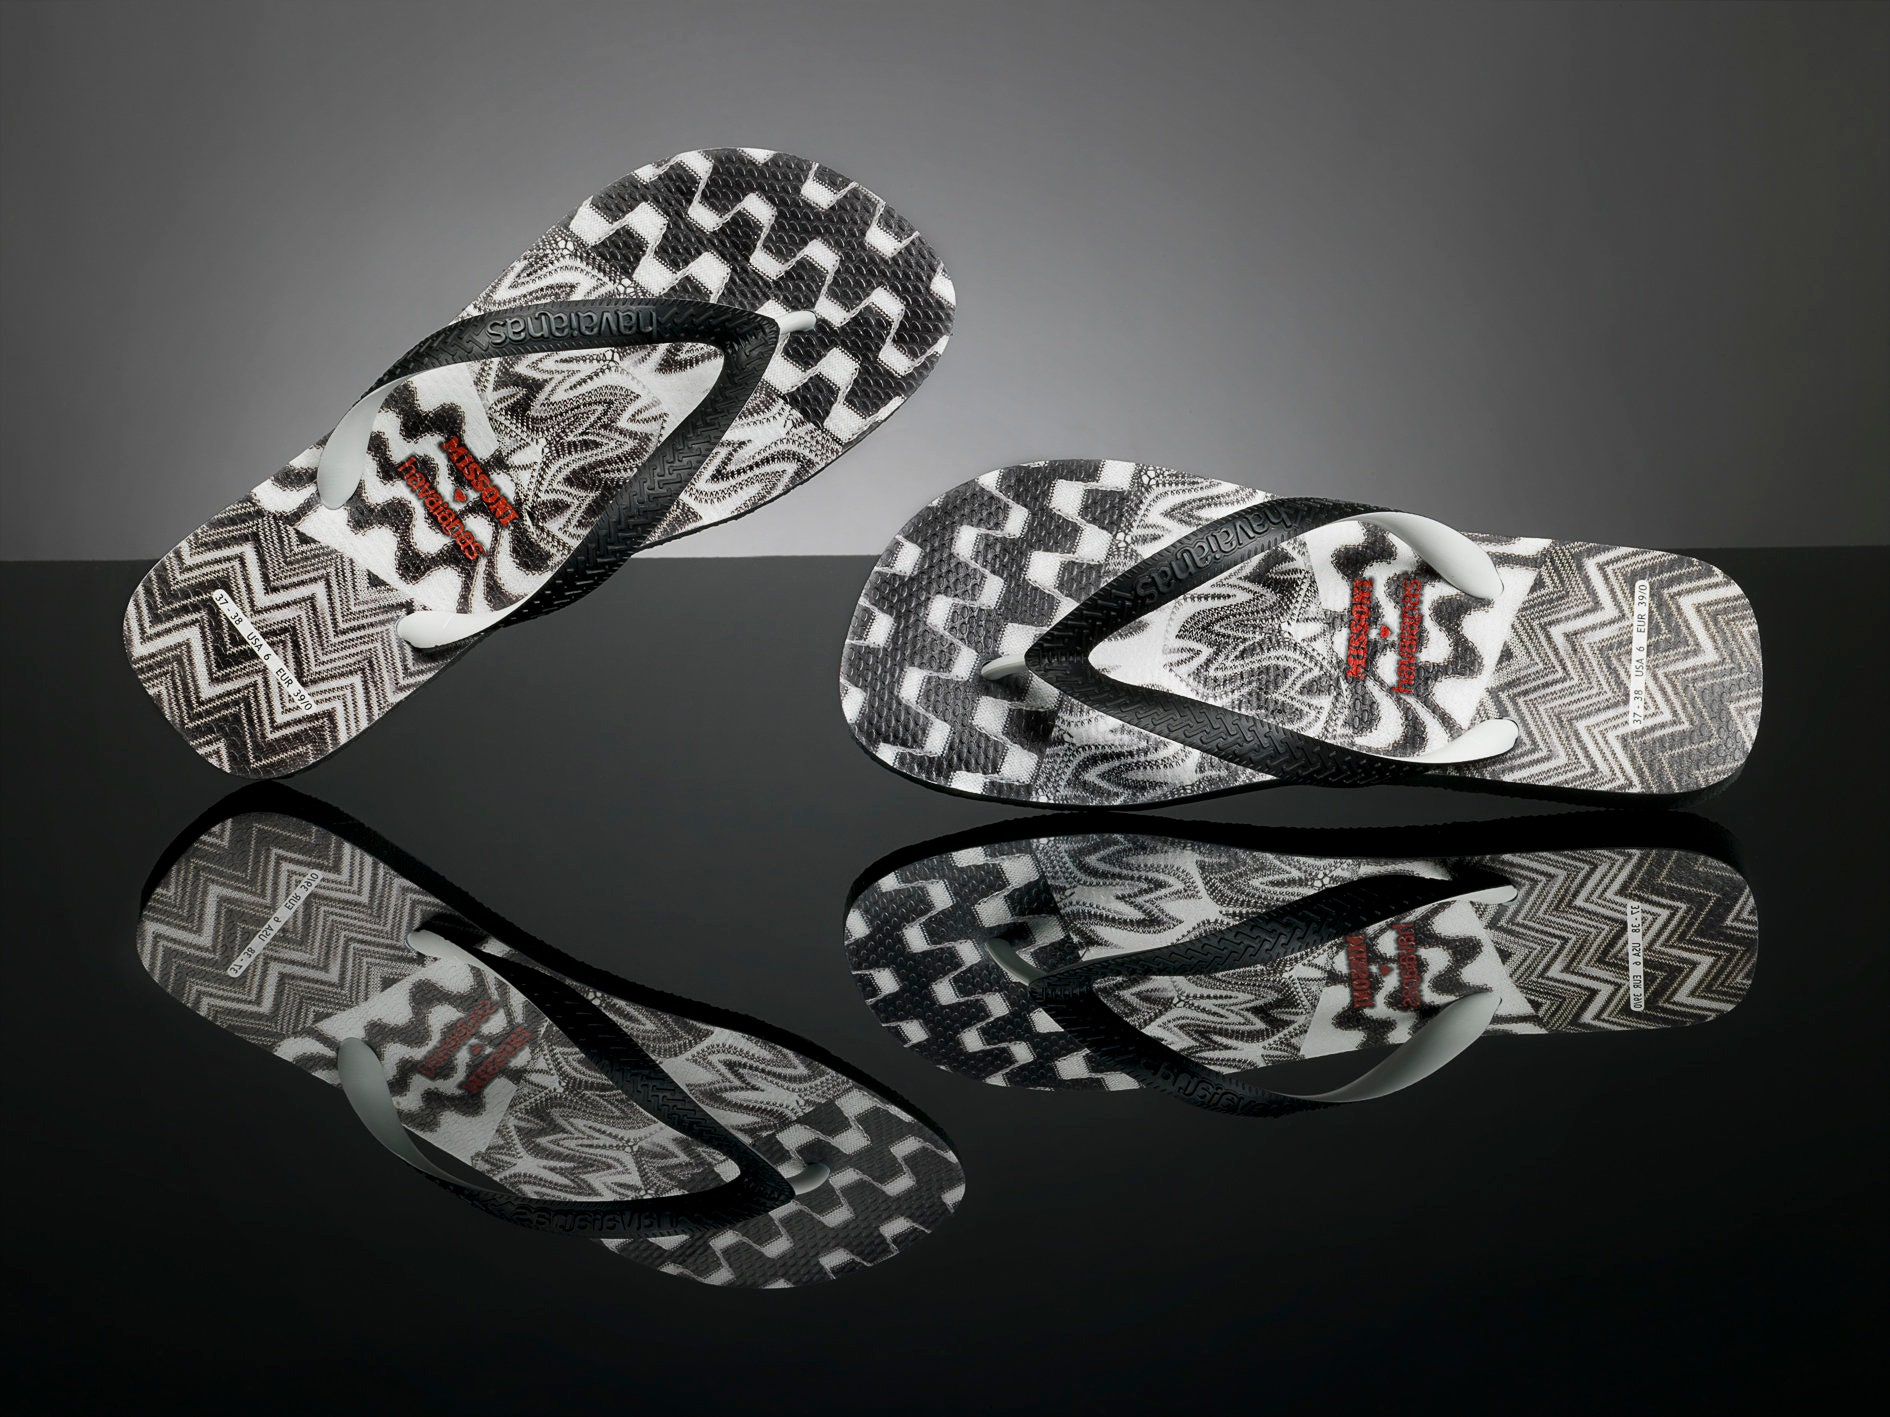 f40fd523dcd5 MISSONI Havaianas flip flops Black Zig Zag flat Rare Patch Work w   Swarovski Crystal Rhinestone Jewel Bling GlassSlippers Custom Thong Shoe